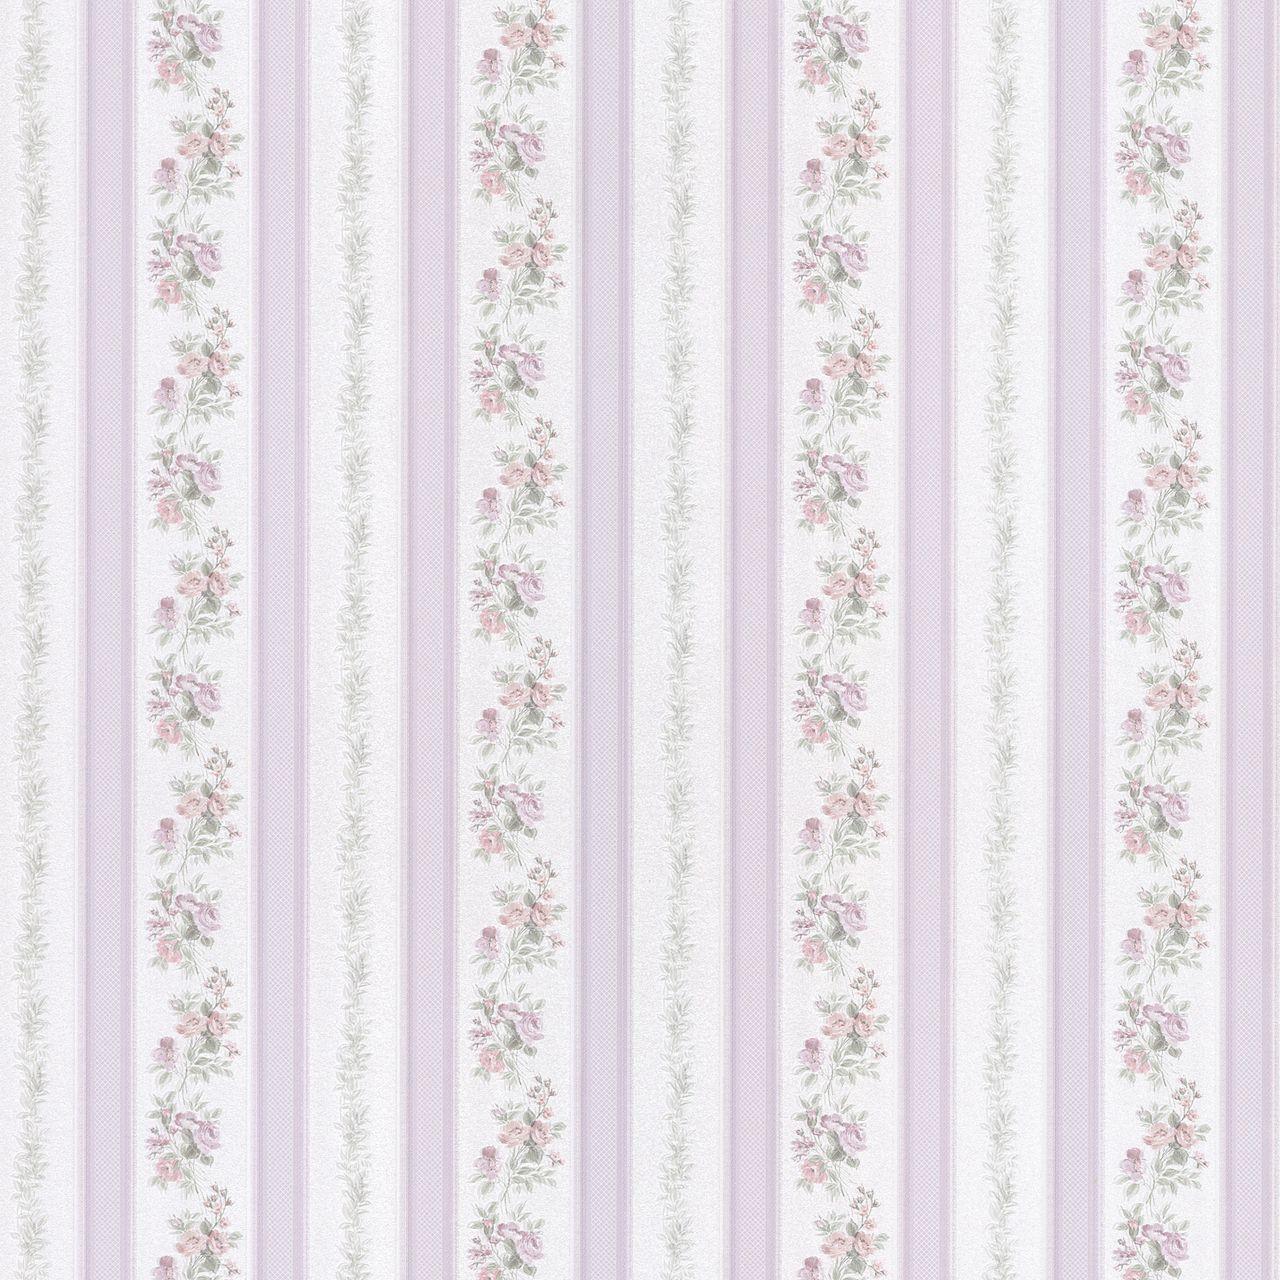 Interior Place - Merle Lavender Floral Stripe 2532-56030 Wallpaper, 41.60 CAD (http://www.interiorplace.com/merle-lavender-floral-stripe-2532-56030-wallpaper/)